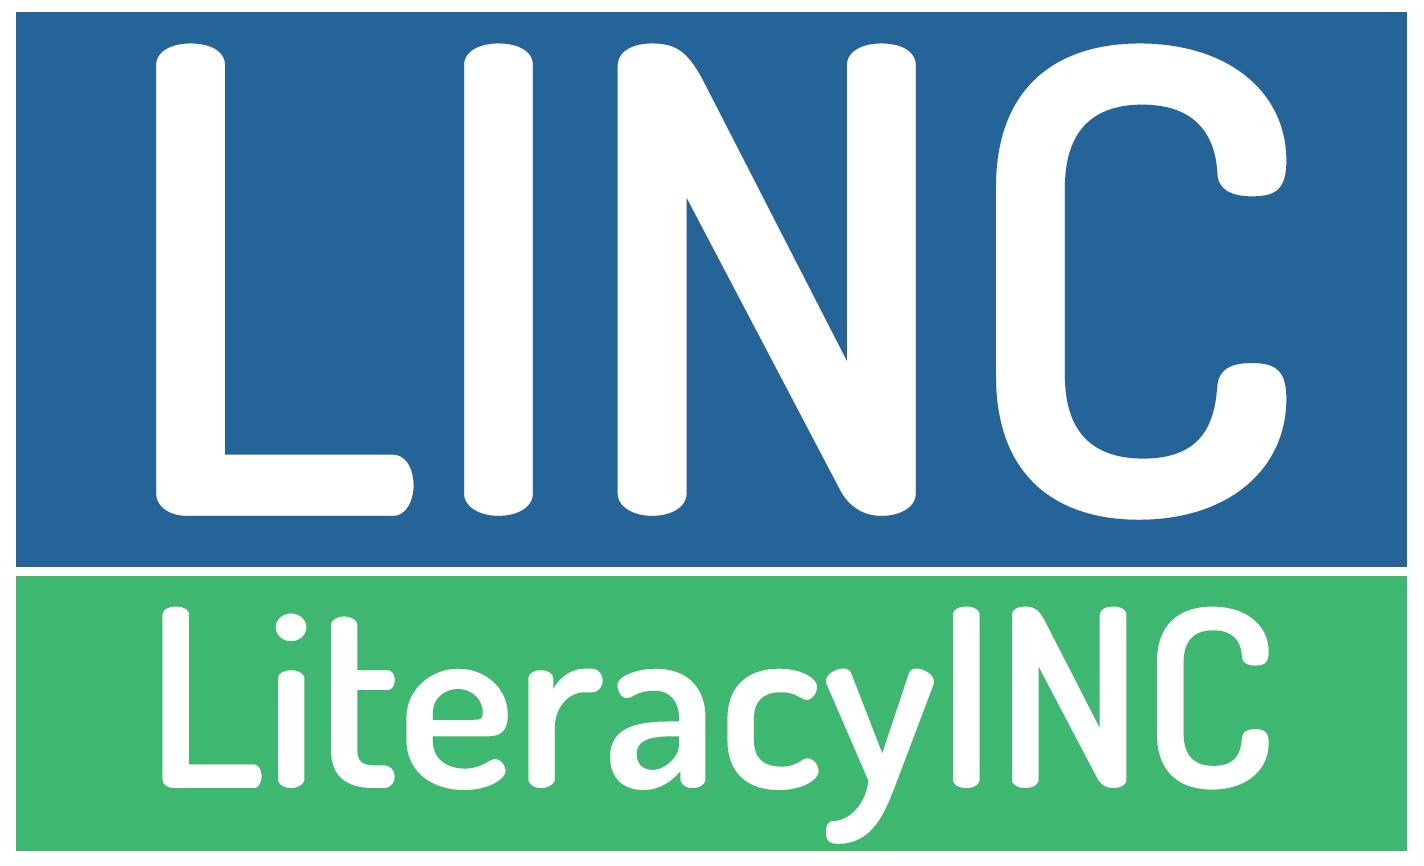 Literacy Inc.